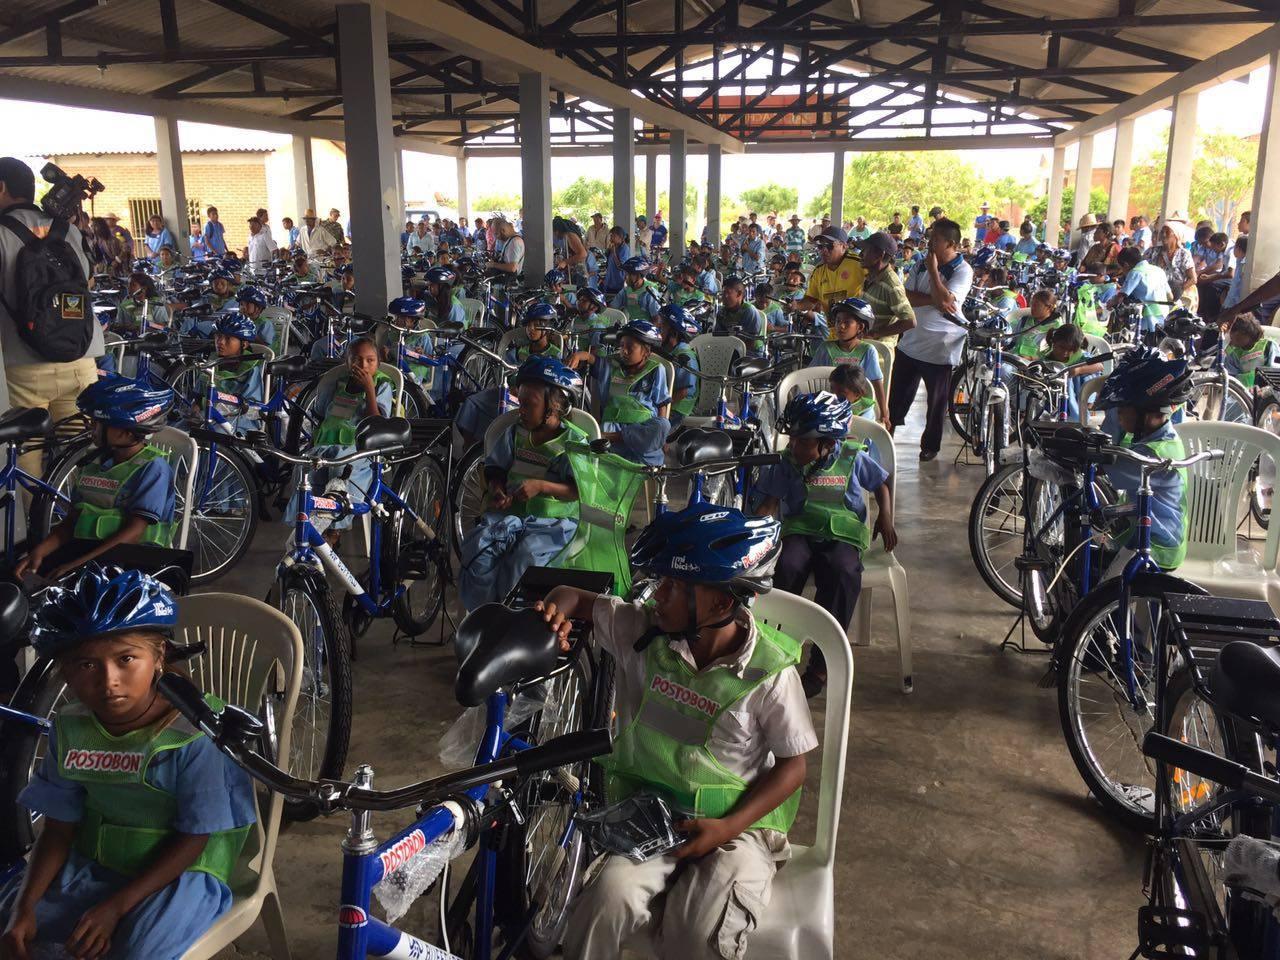 Kids from the Rural Ethnoeducation Institute in Samutpio receive their bikes.